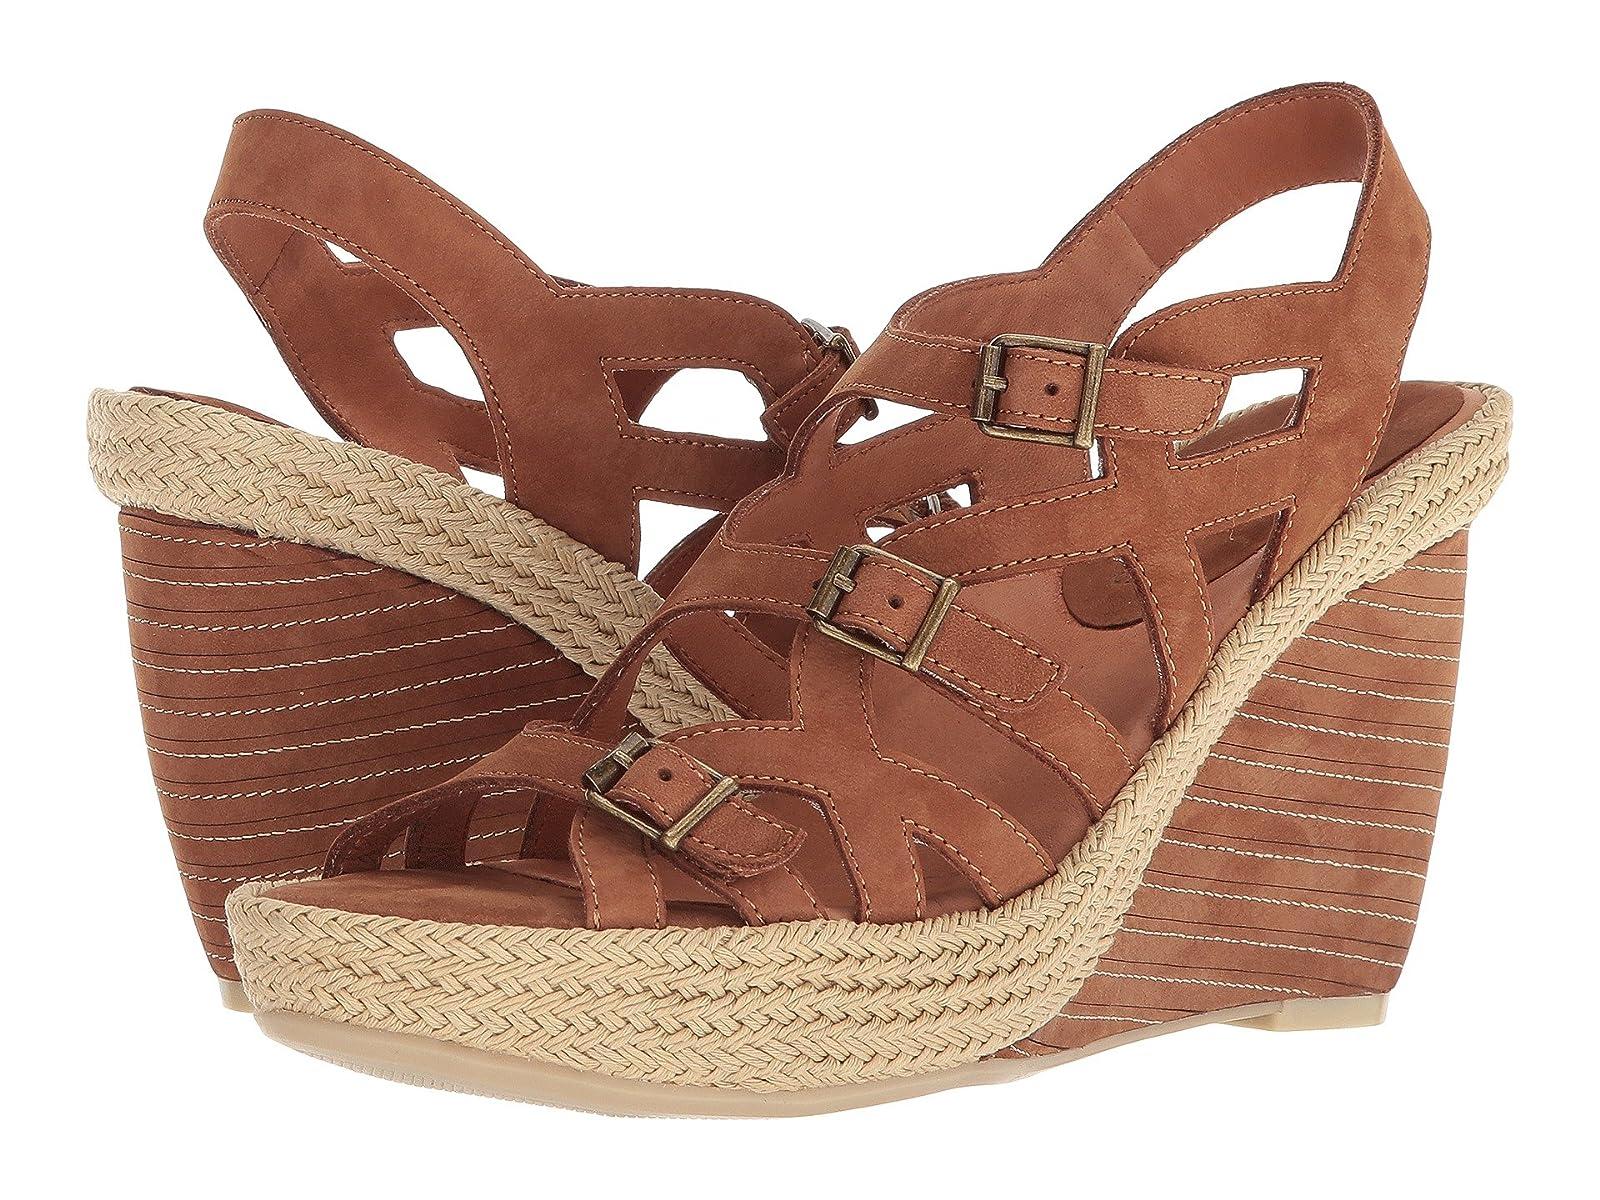 L'Amour Des Pieds IgnaciaCheap and distinctive eye-catching shoes